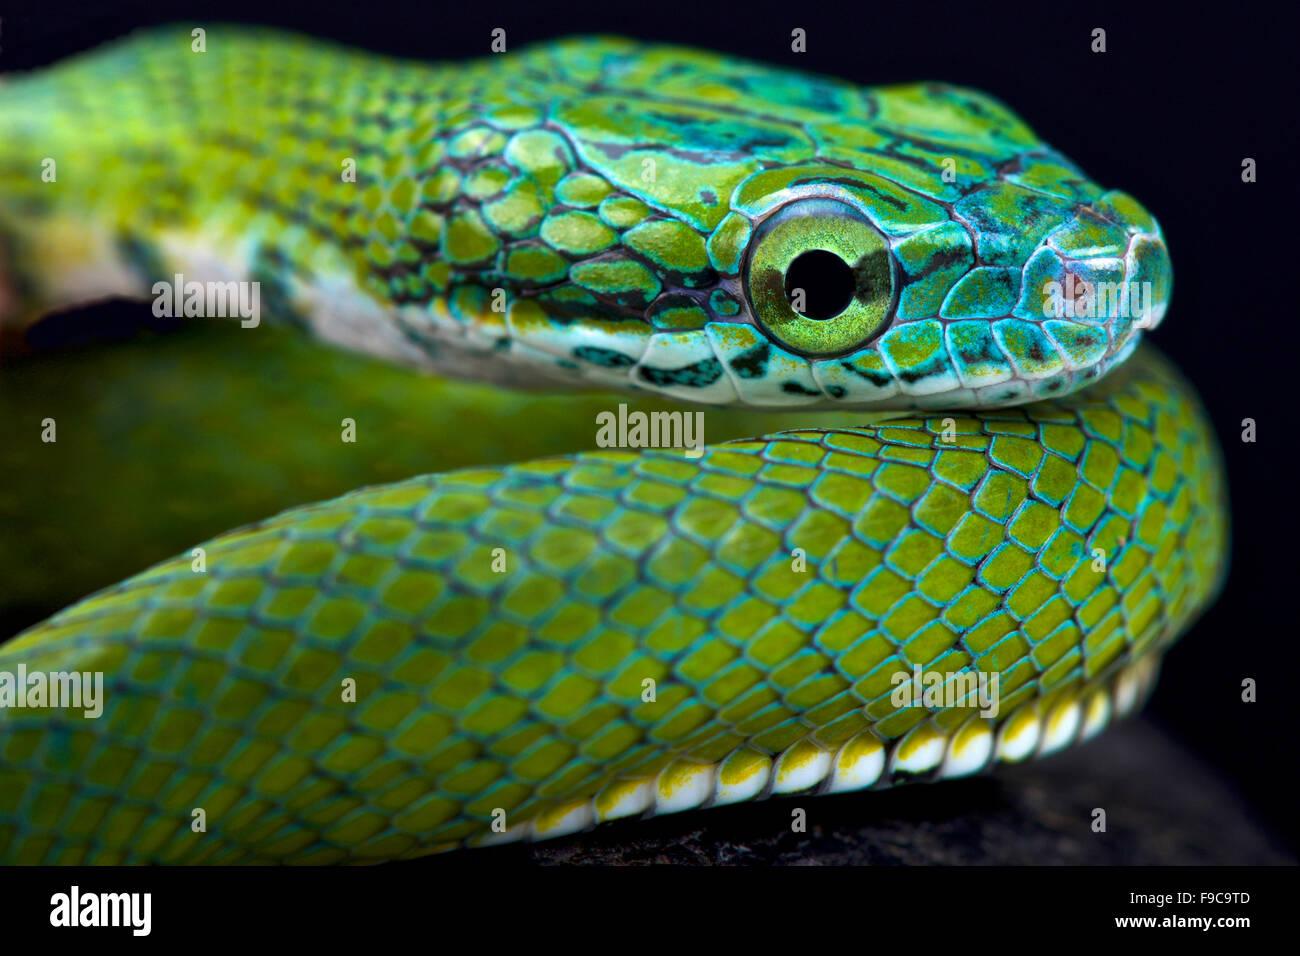 Verde (Rhadinophis ratsnake prasinum) Imagen De Stock